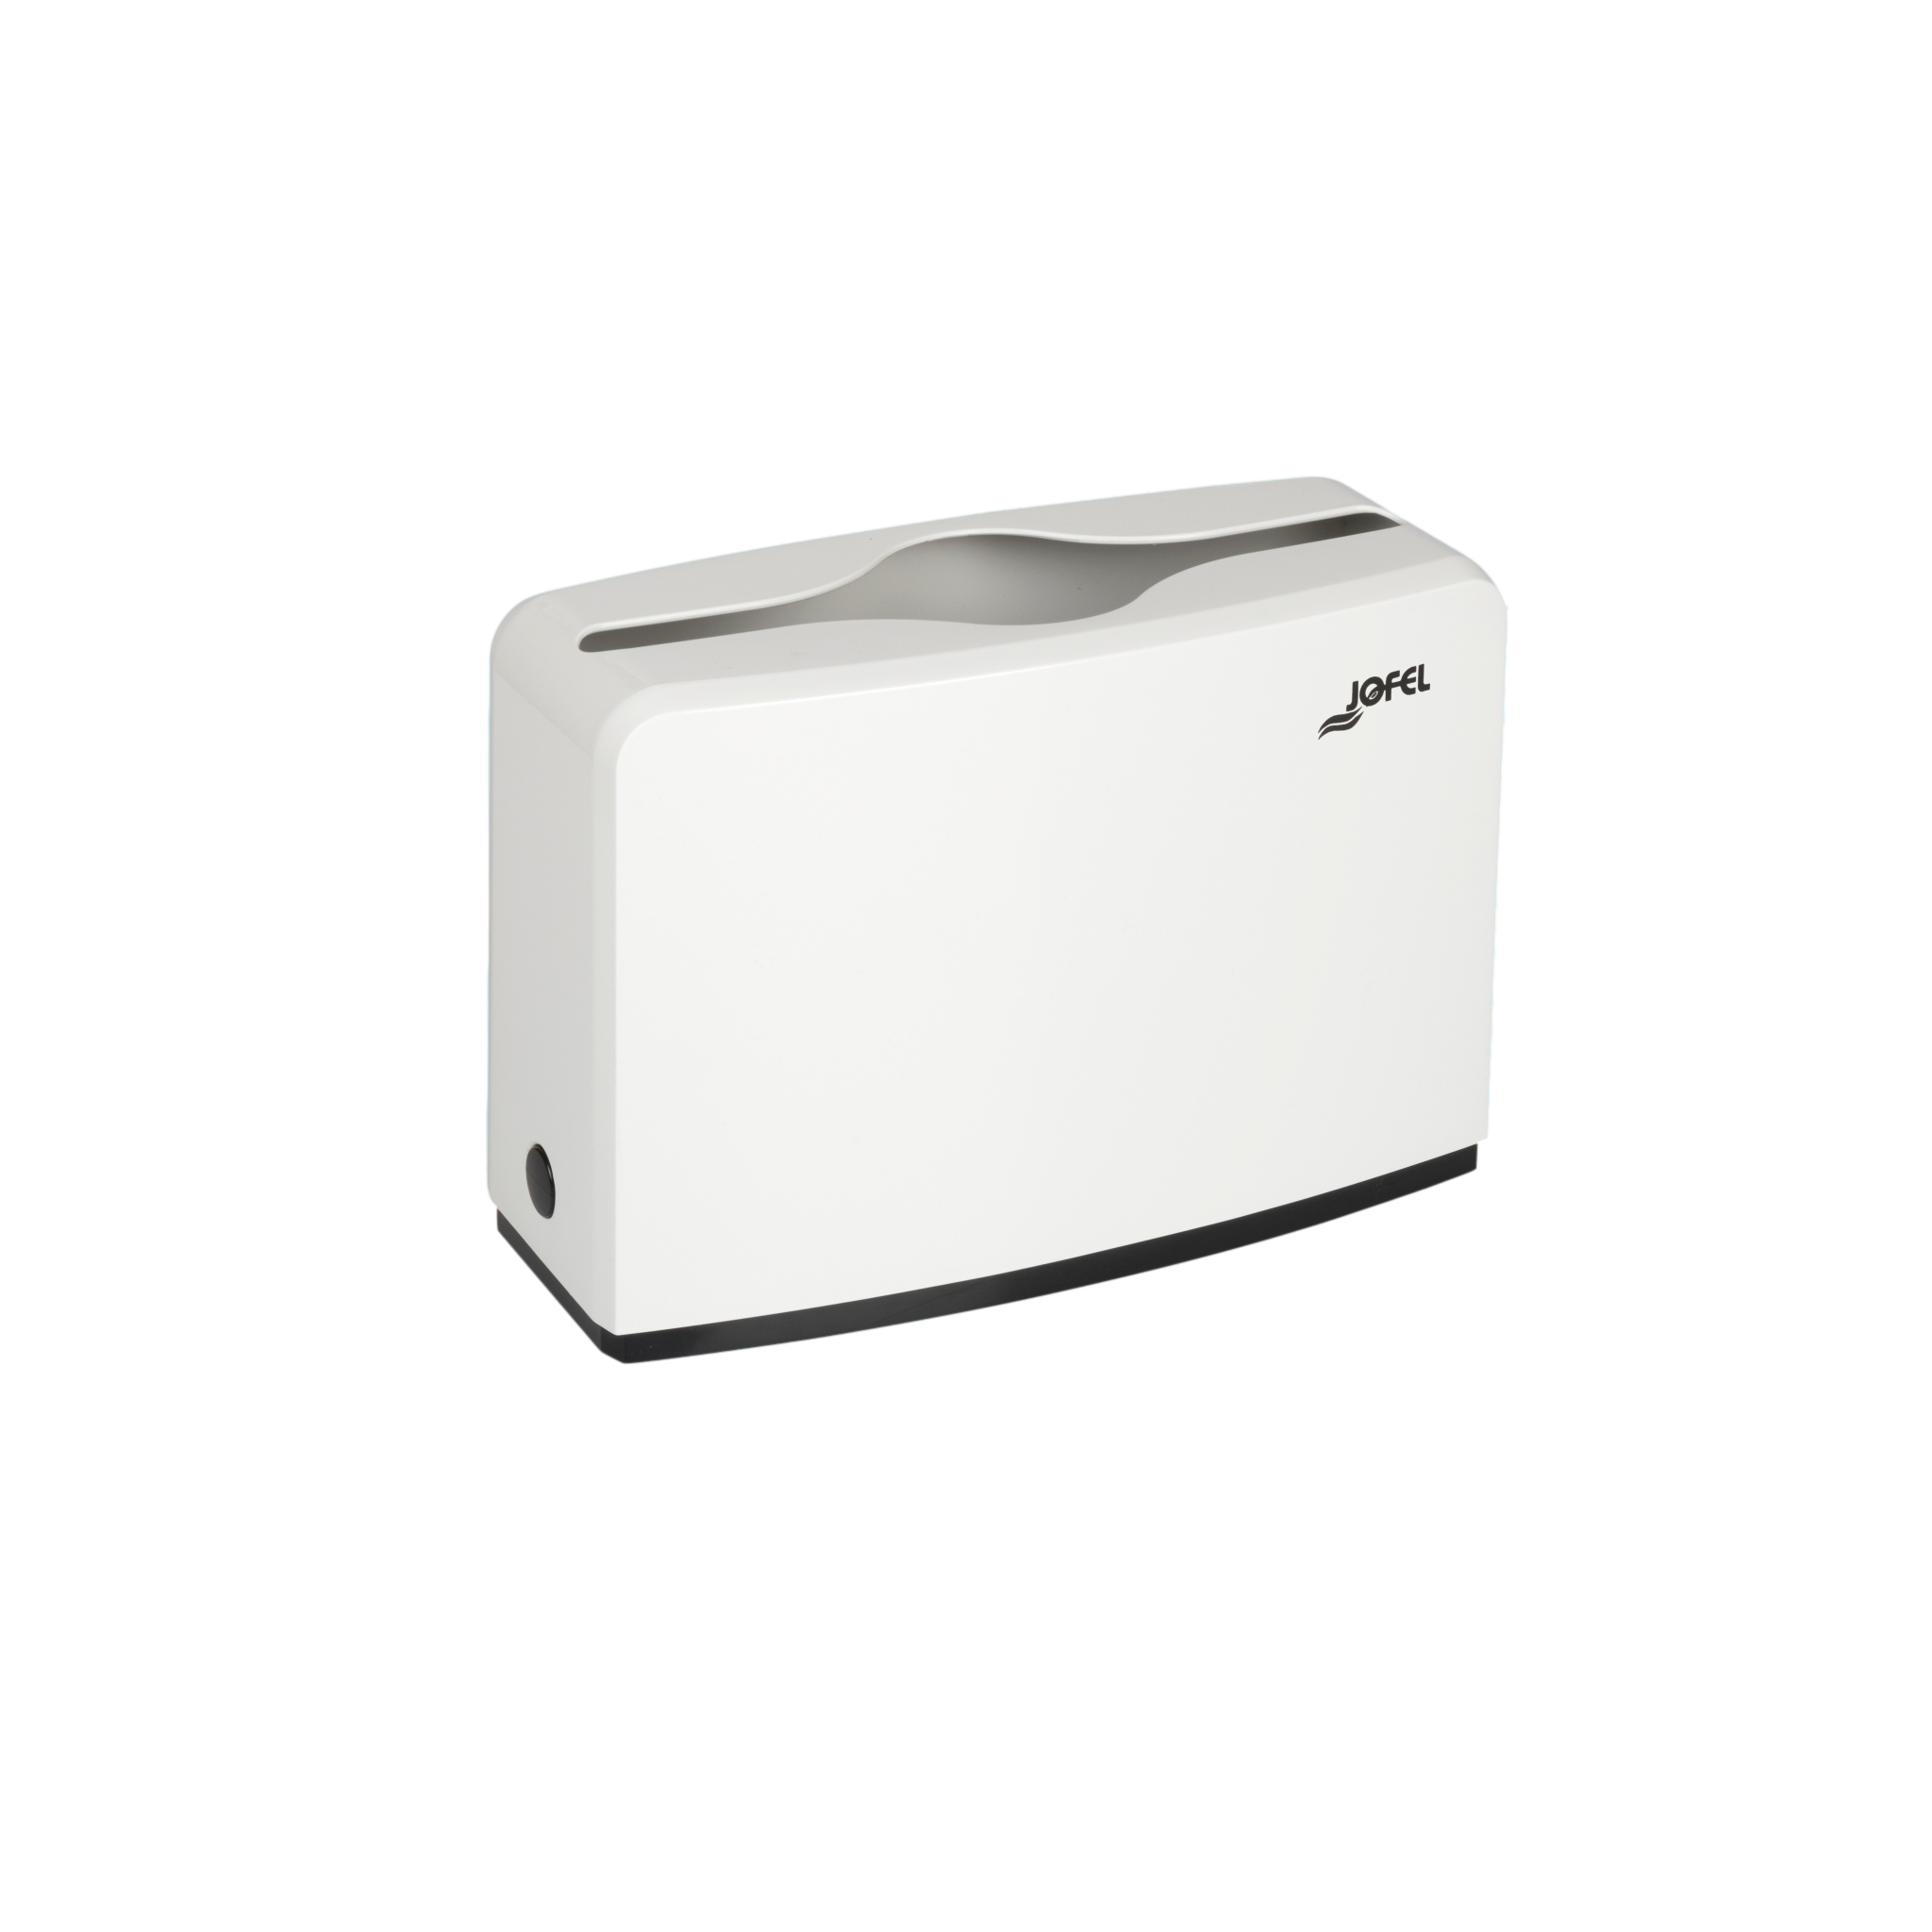 Jofel lehtkätepaberi dosaator, W ja Z, lauapealne, valge, 185x273x118 mm